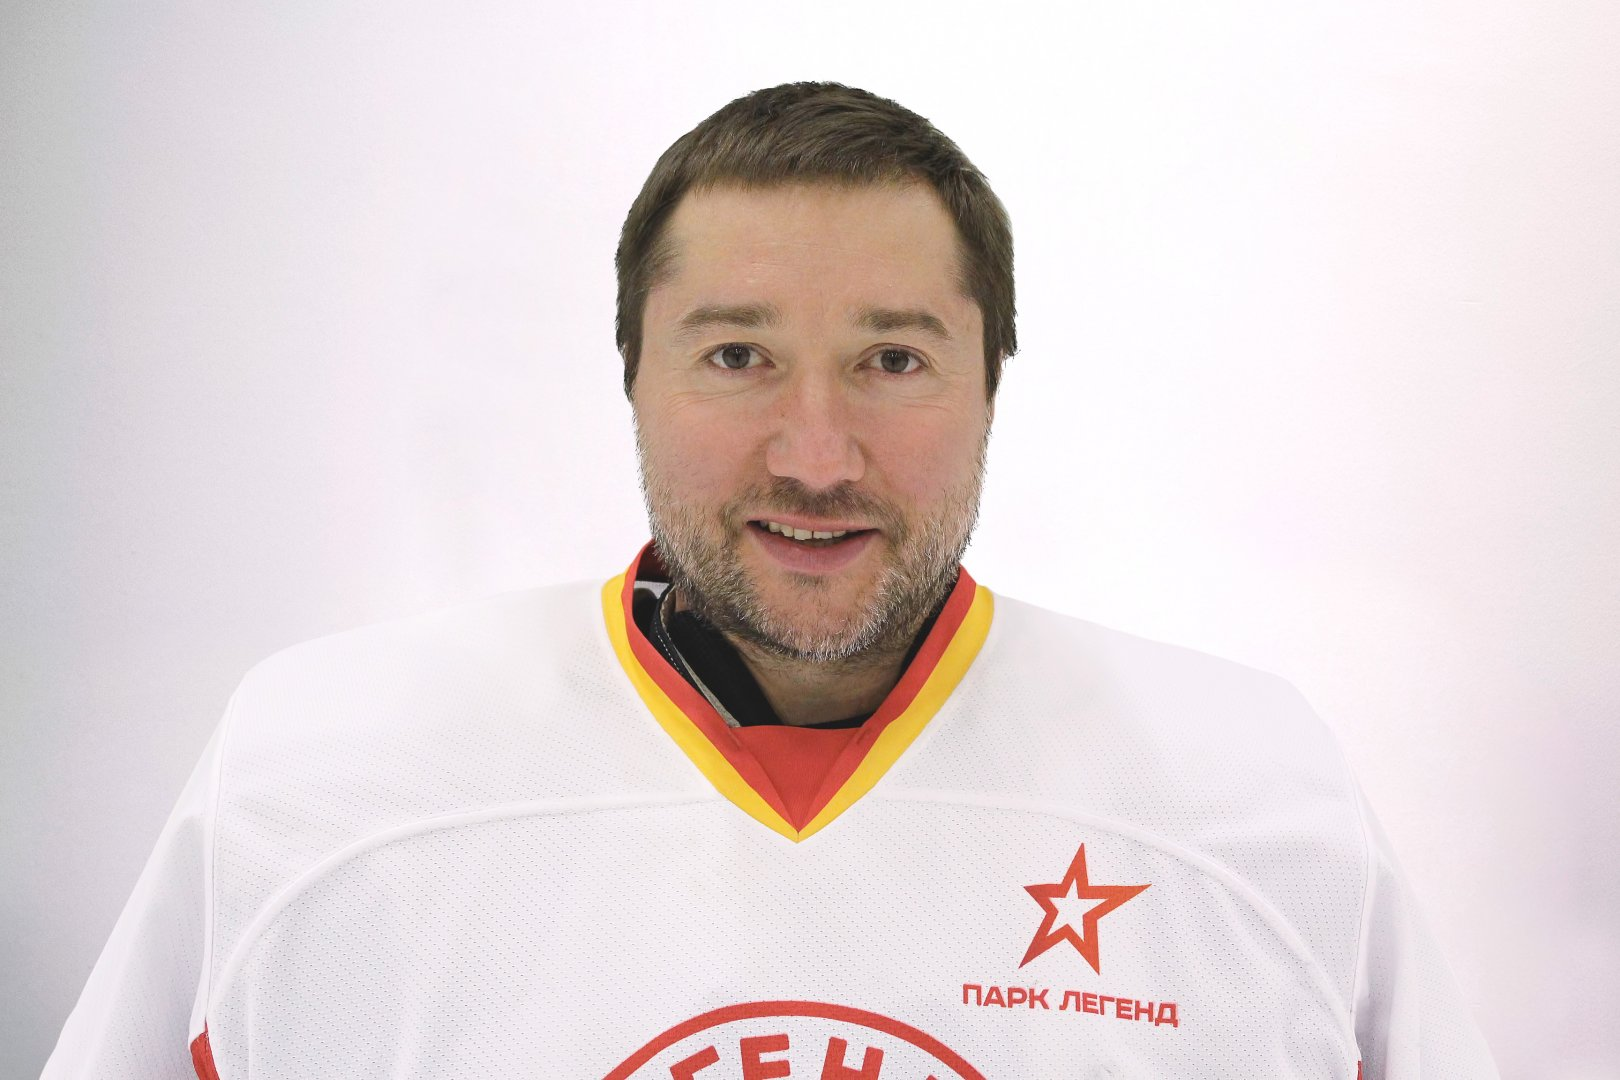 Мухометов Ильдар Рафекович